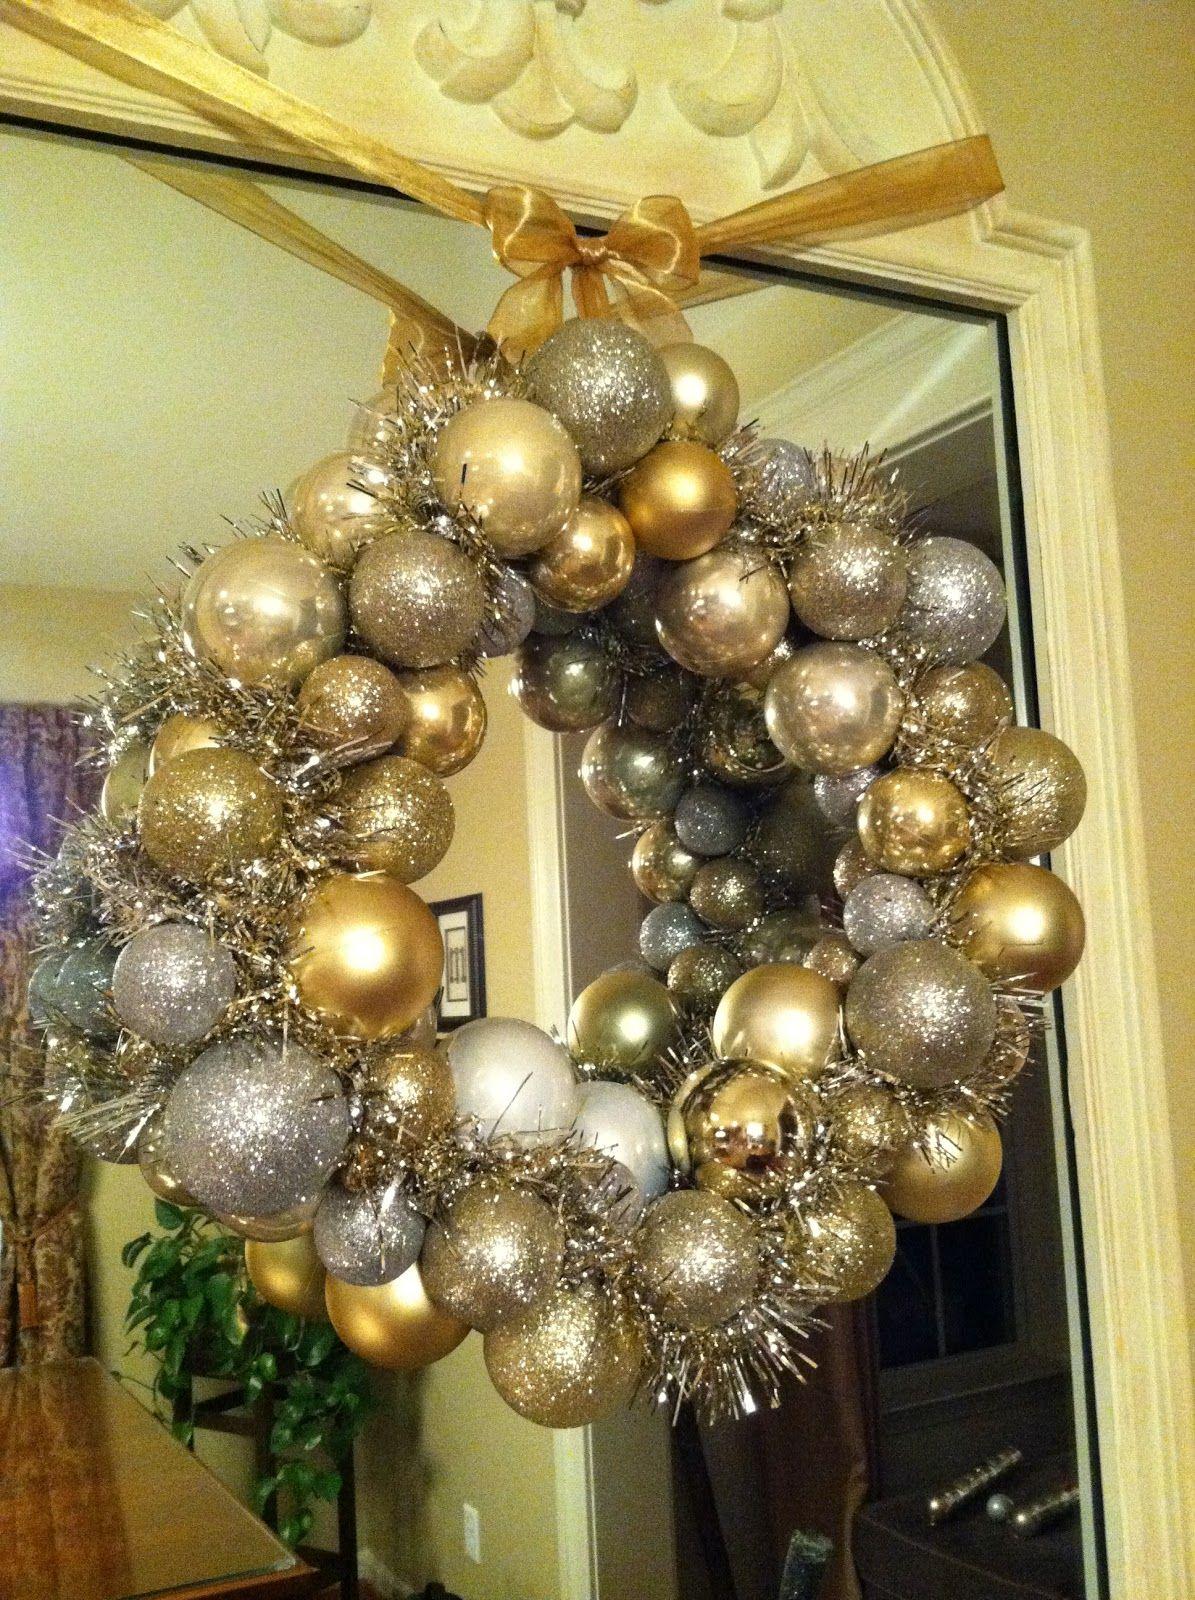 Wire hanger wreath. Need 1 wire hanger. Dollar tree